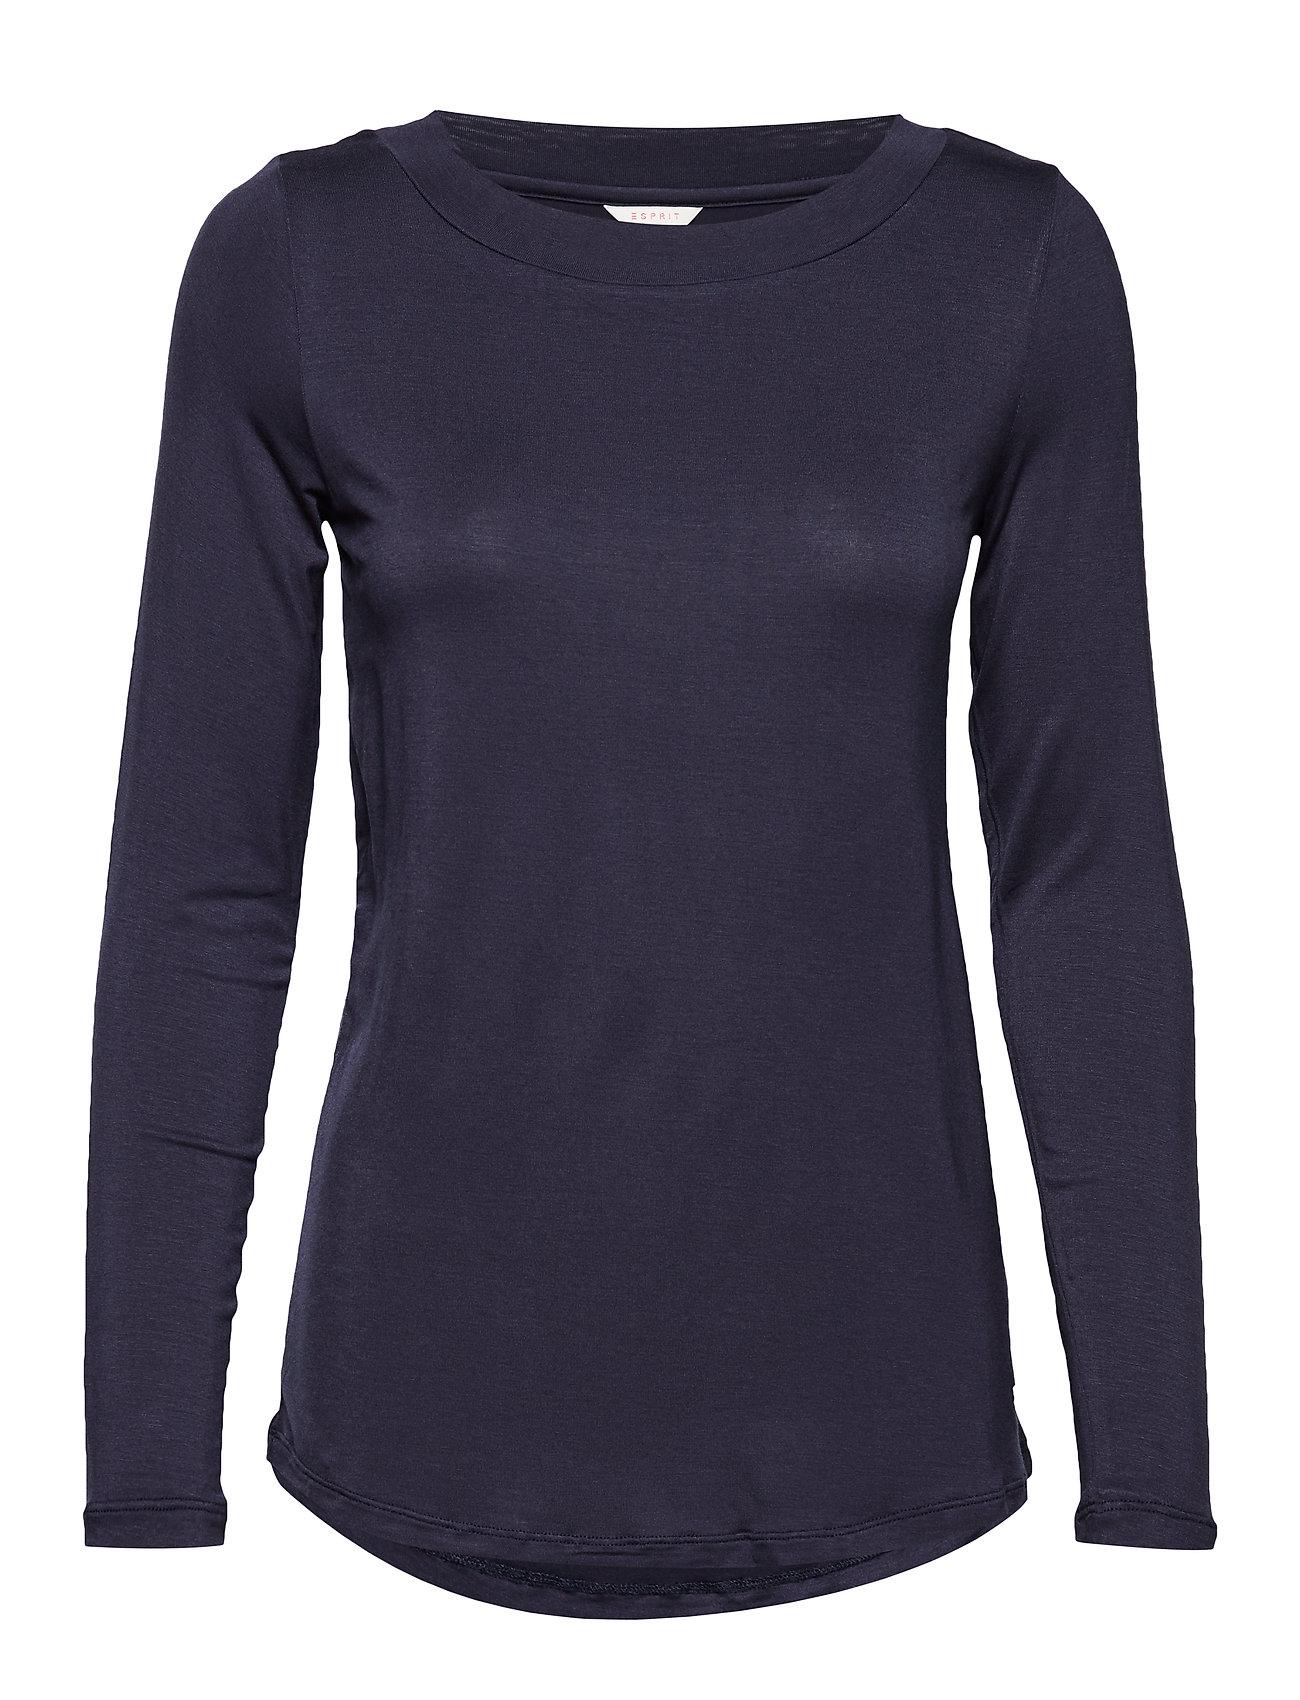 Esprit Bodywear Women Night-T-Shirts - NAVY